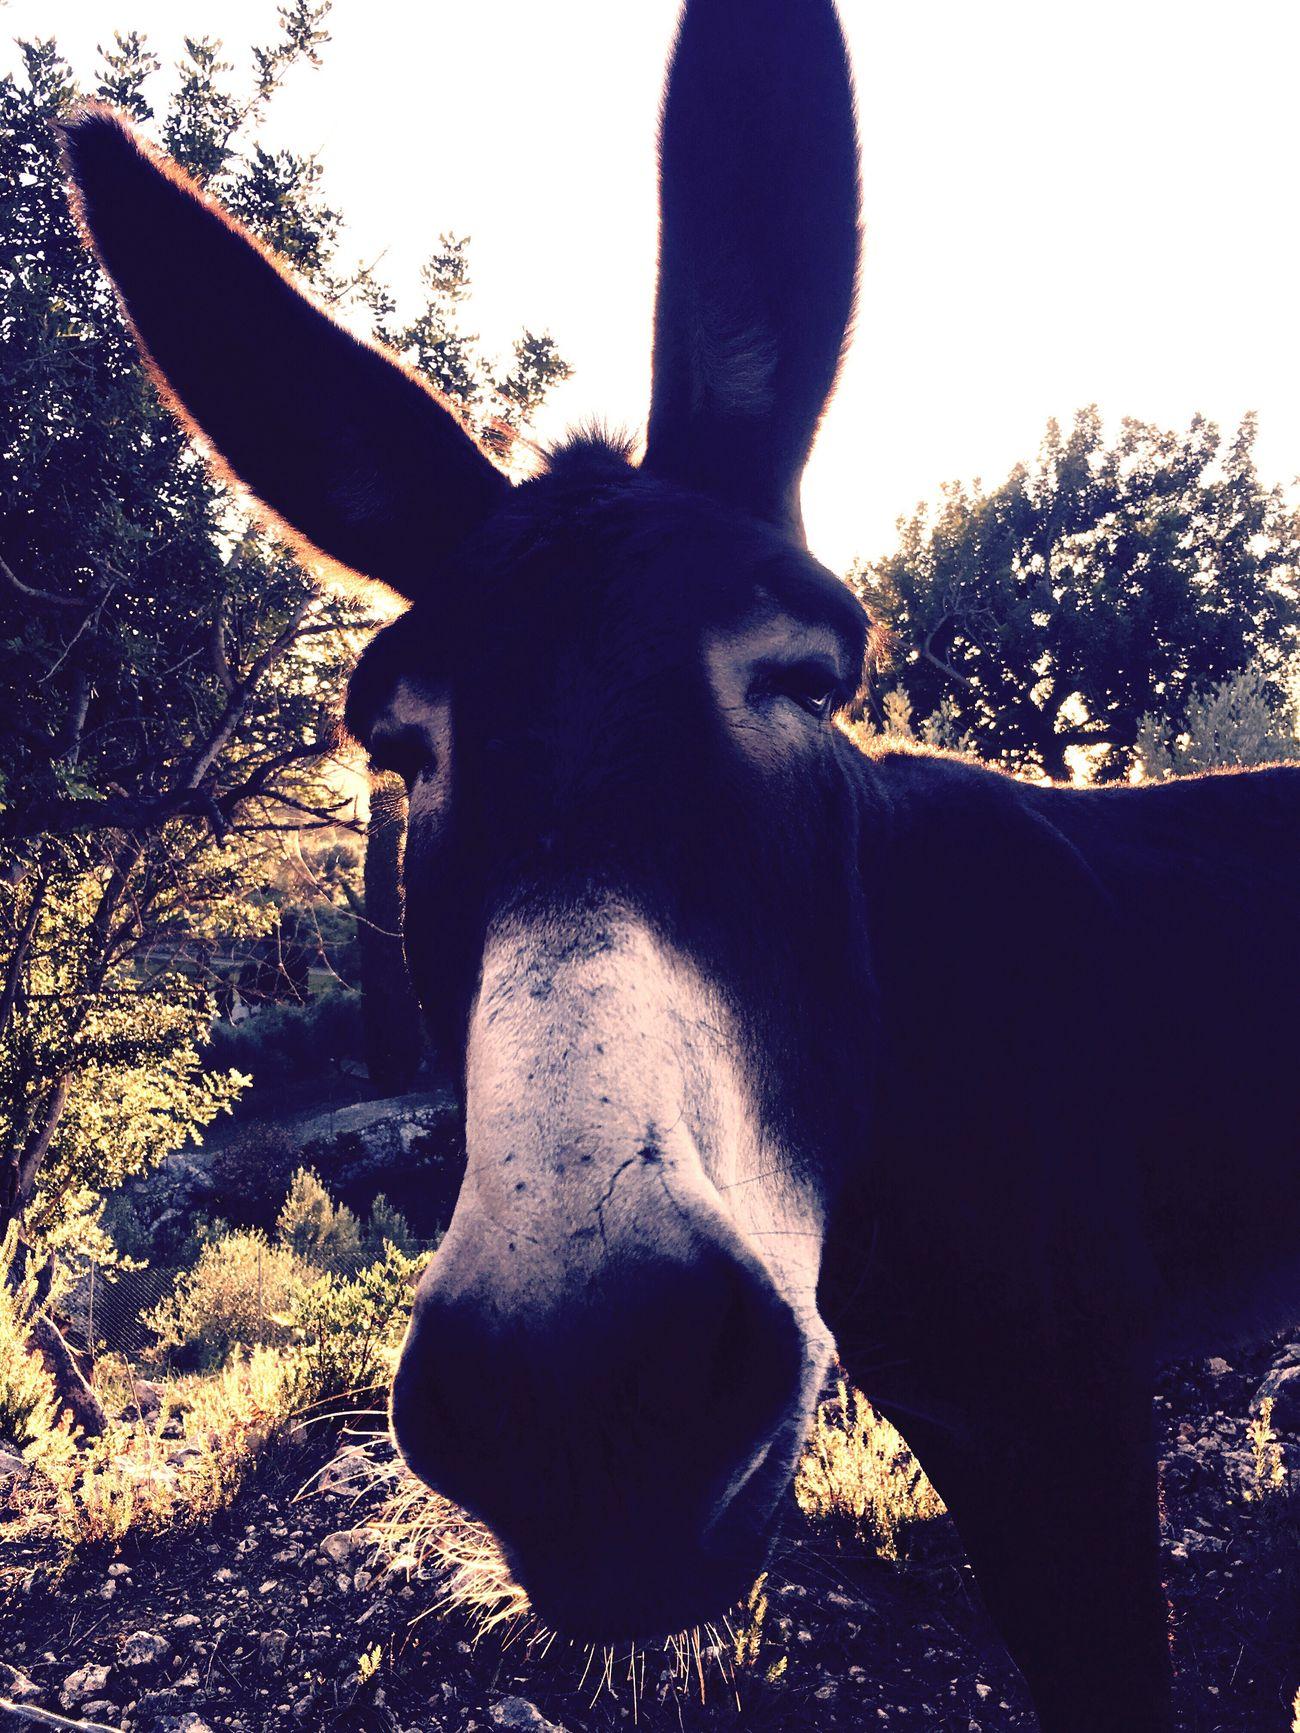 One Animal Looking At Camera Close-up Nature Donkey Donkey Time Animal Newfriends Makesmesmile Curiosity